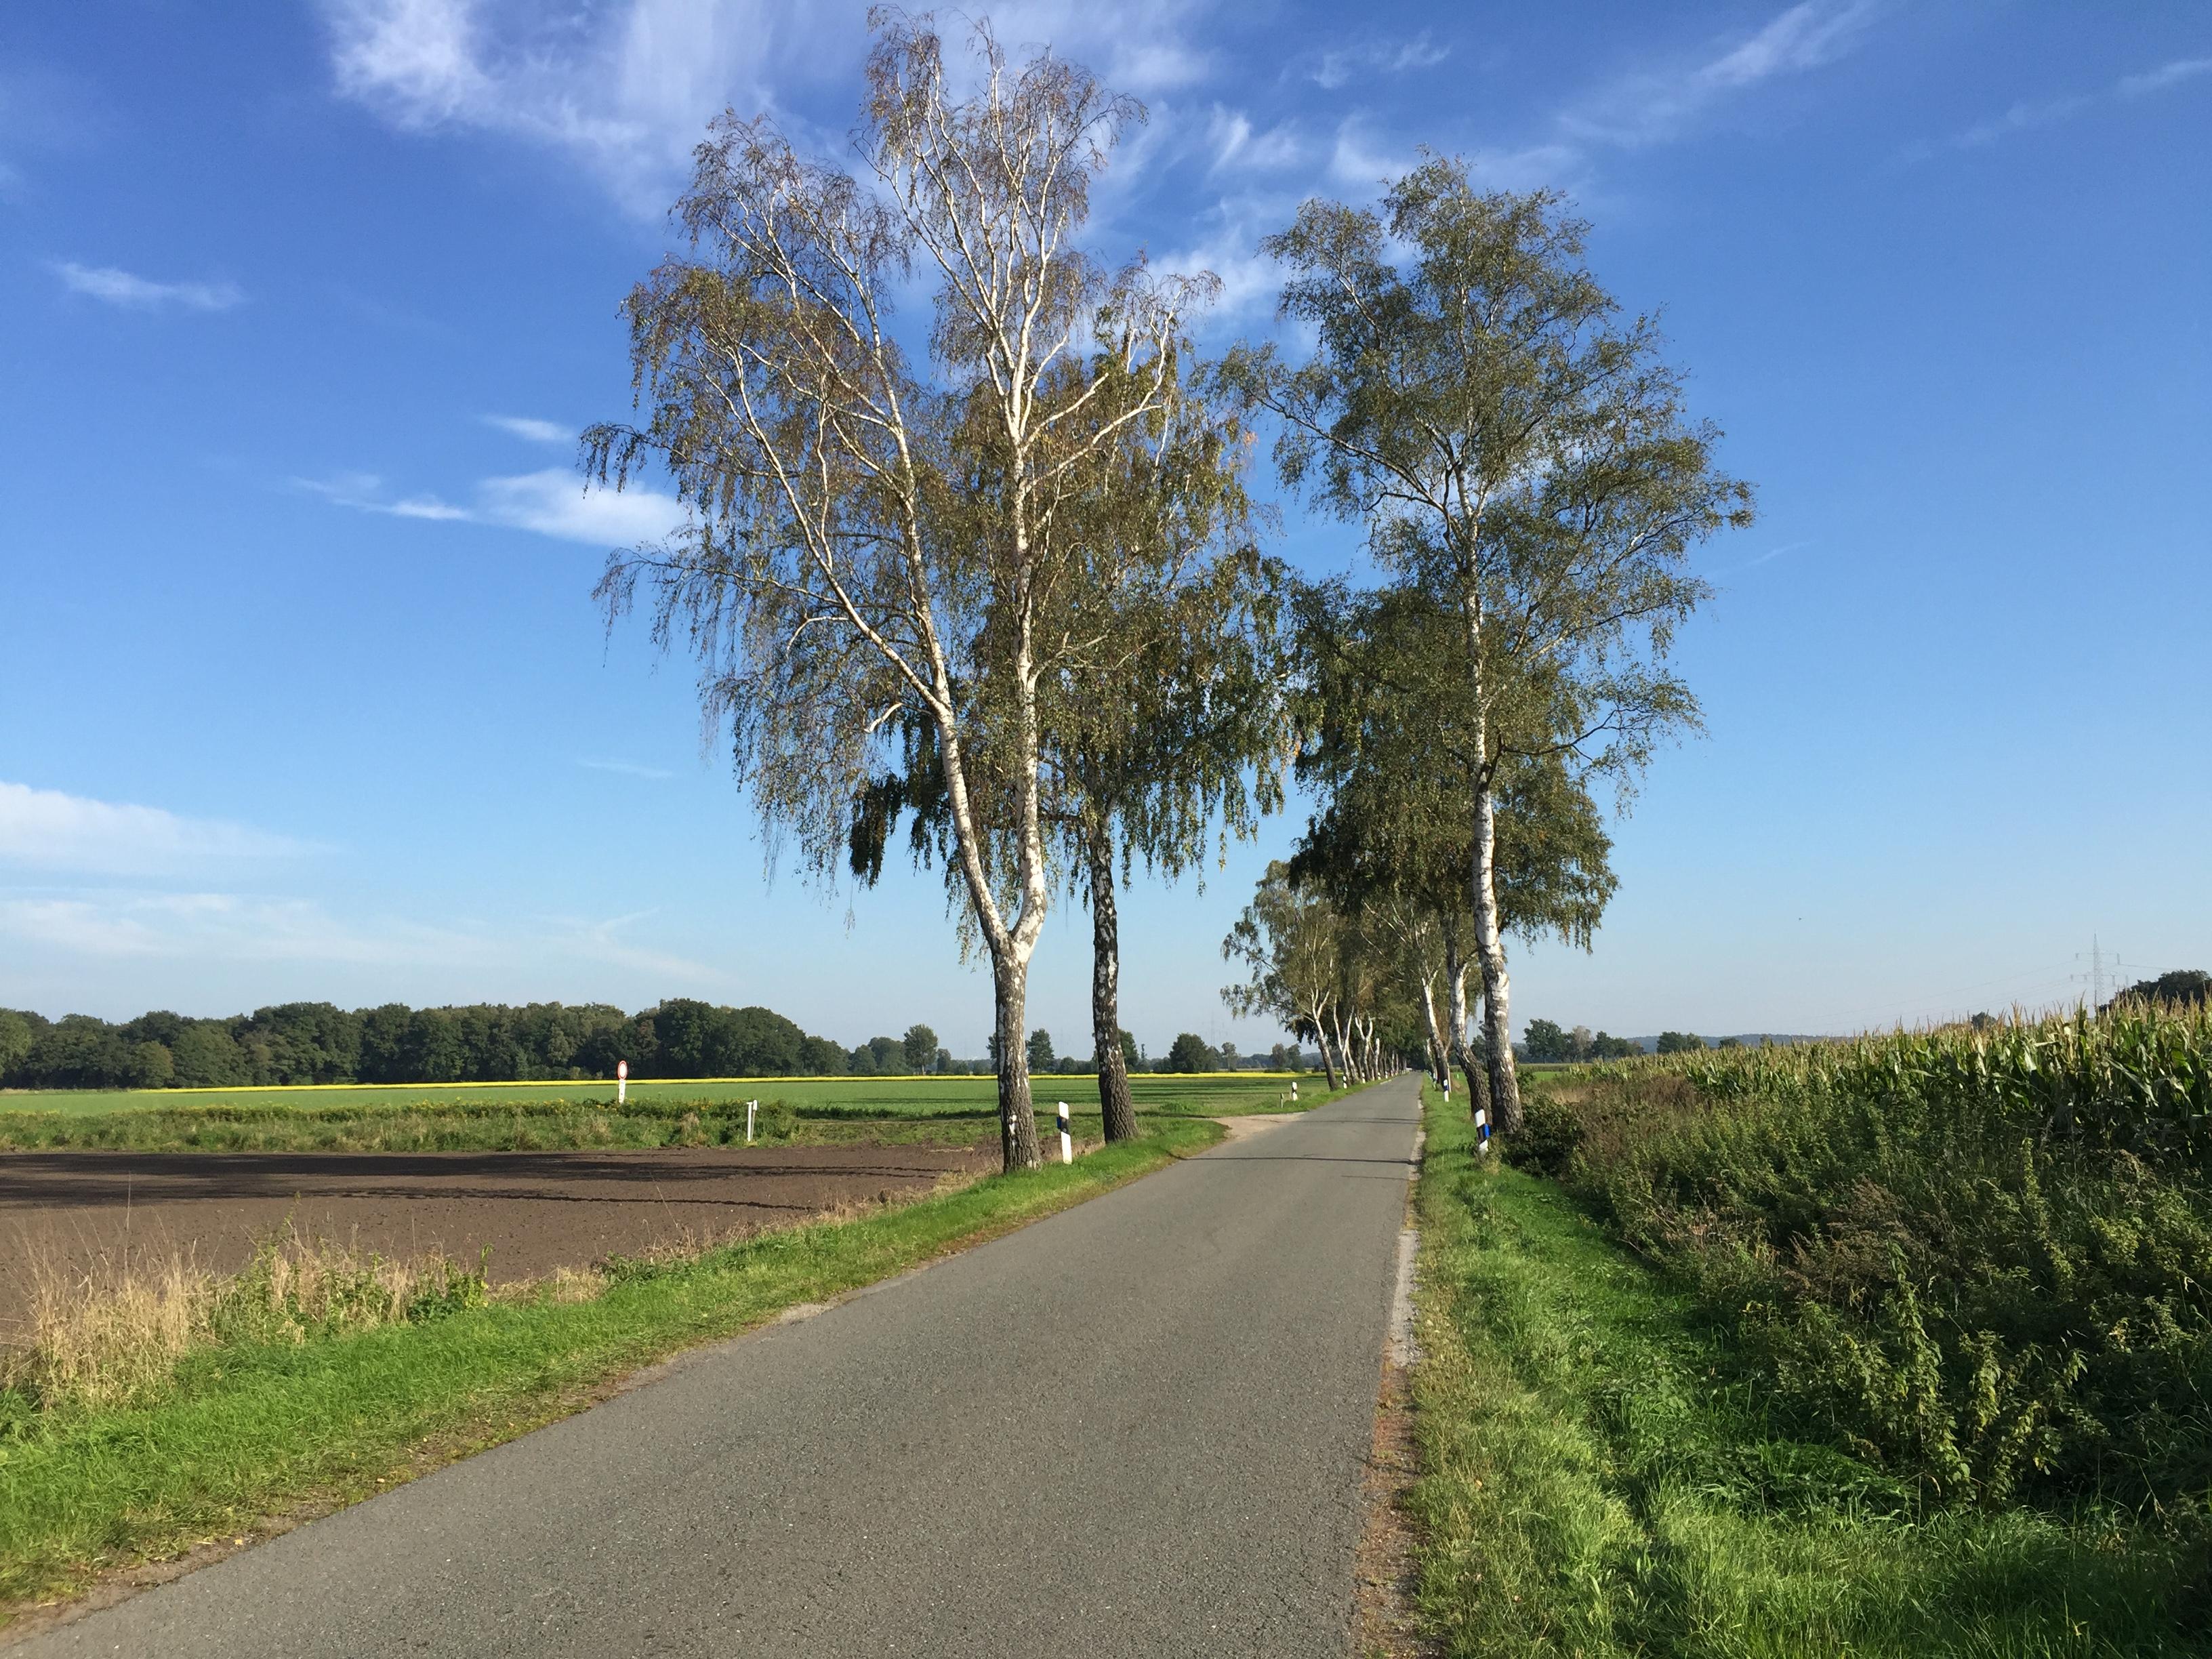 On the road between Vesbeck and Abbensen